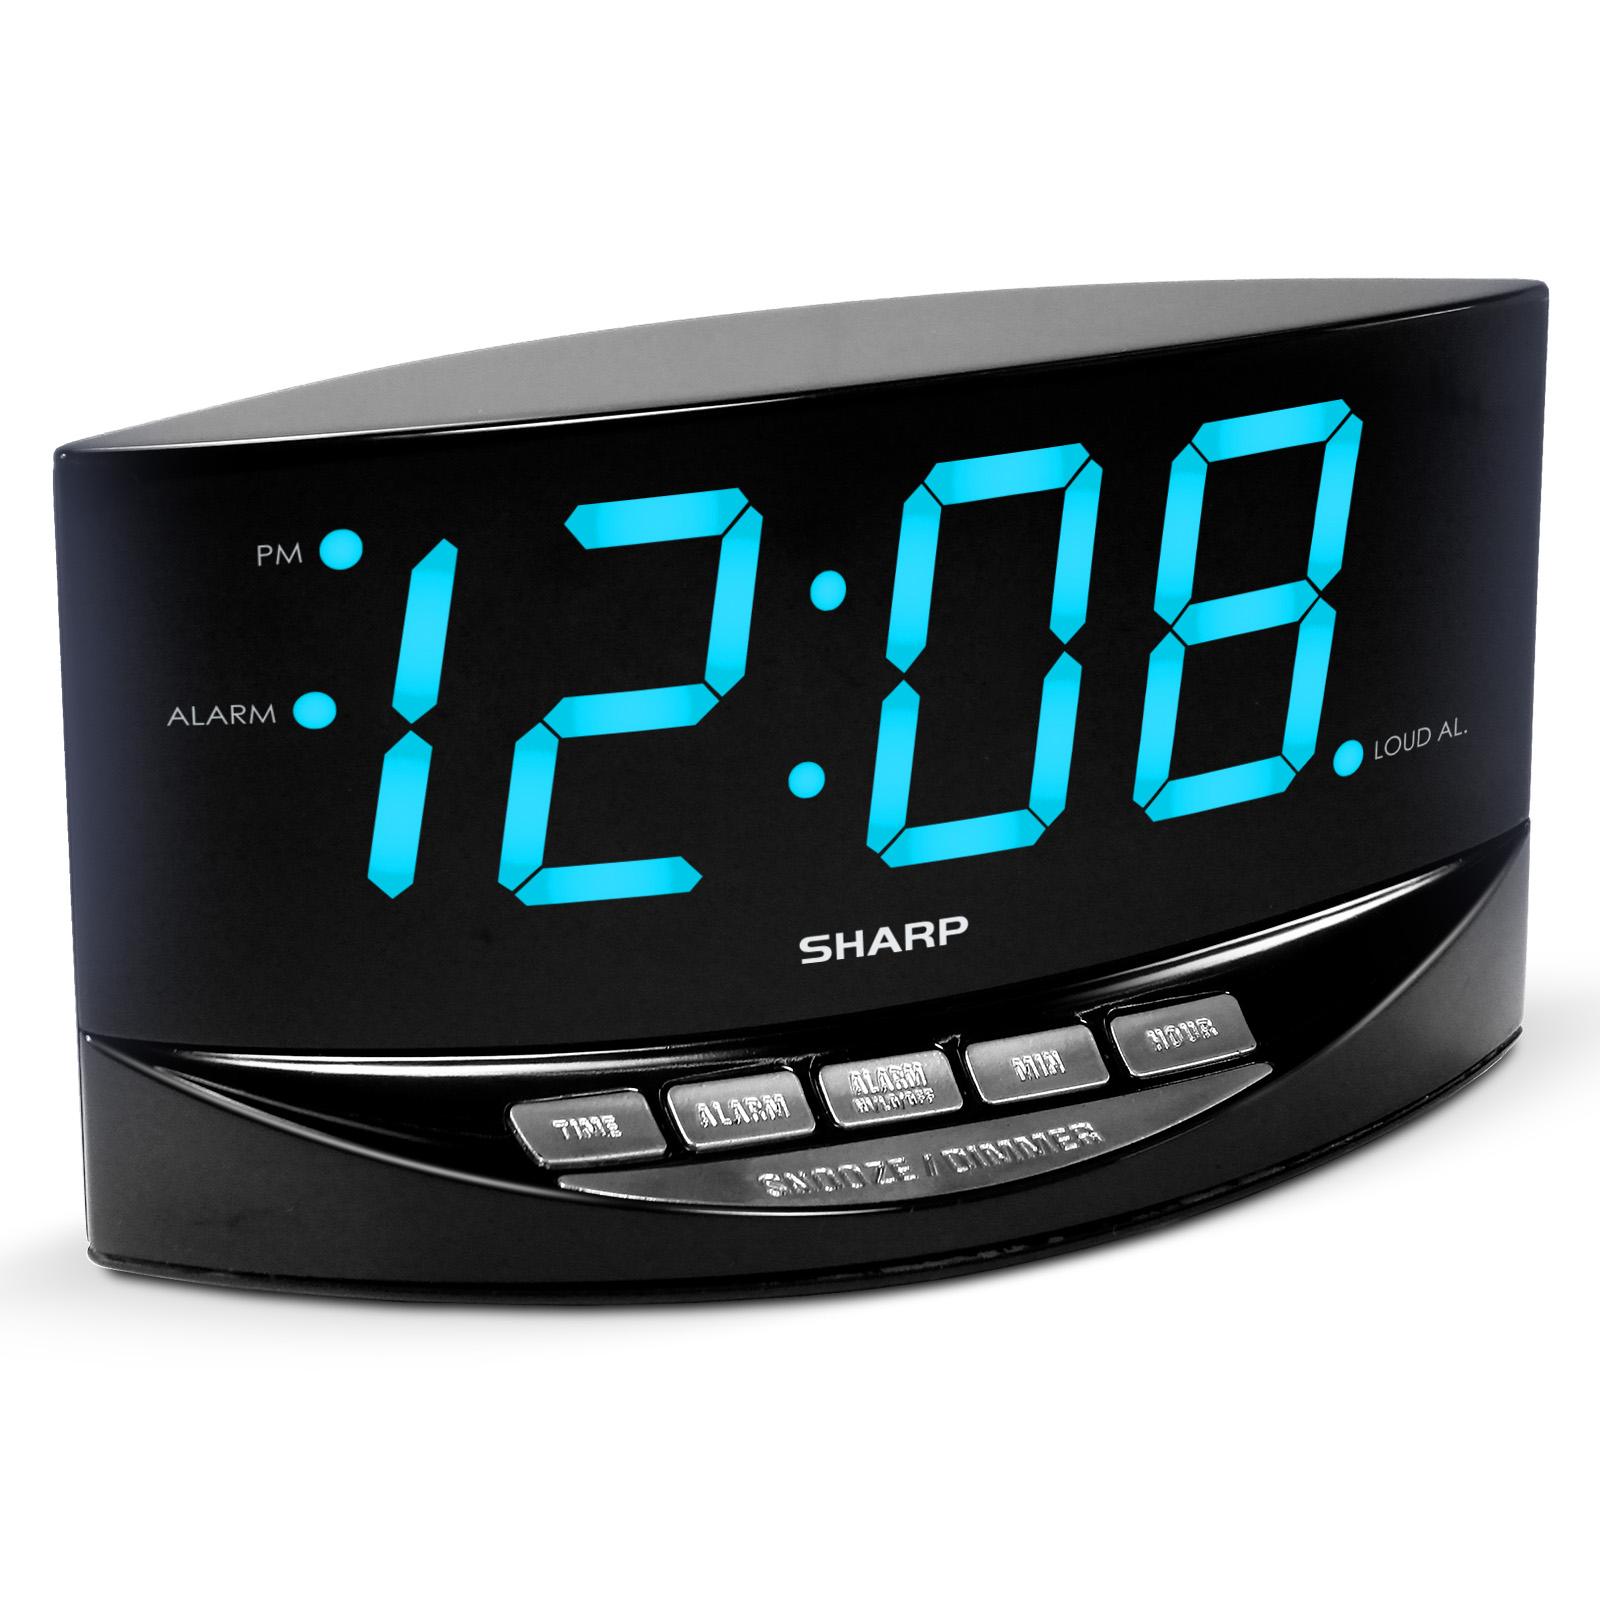 Sharp Spc754 Digital Alarm Clock